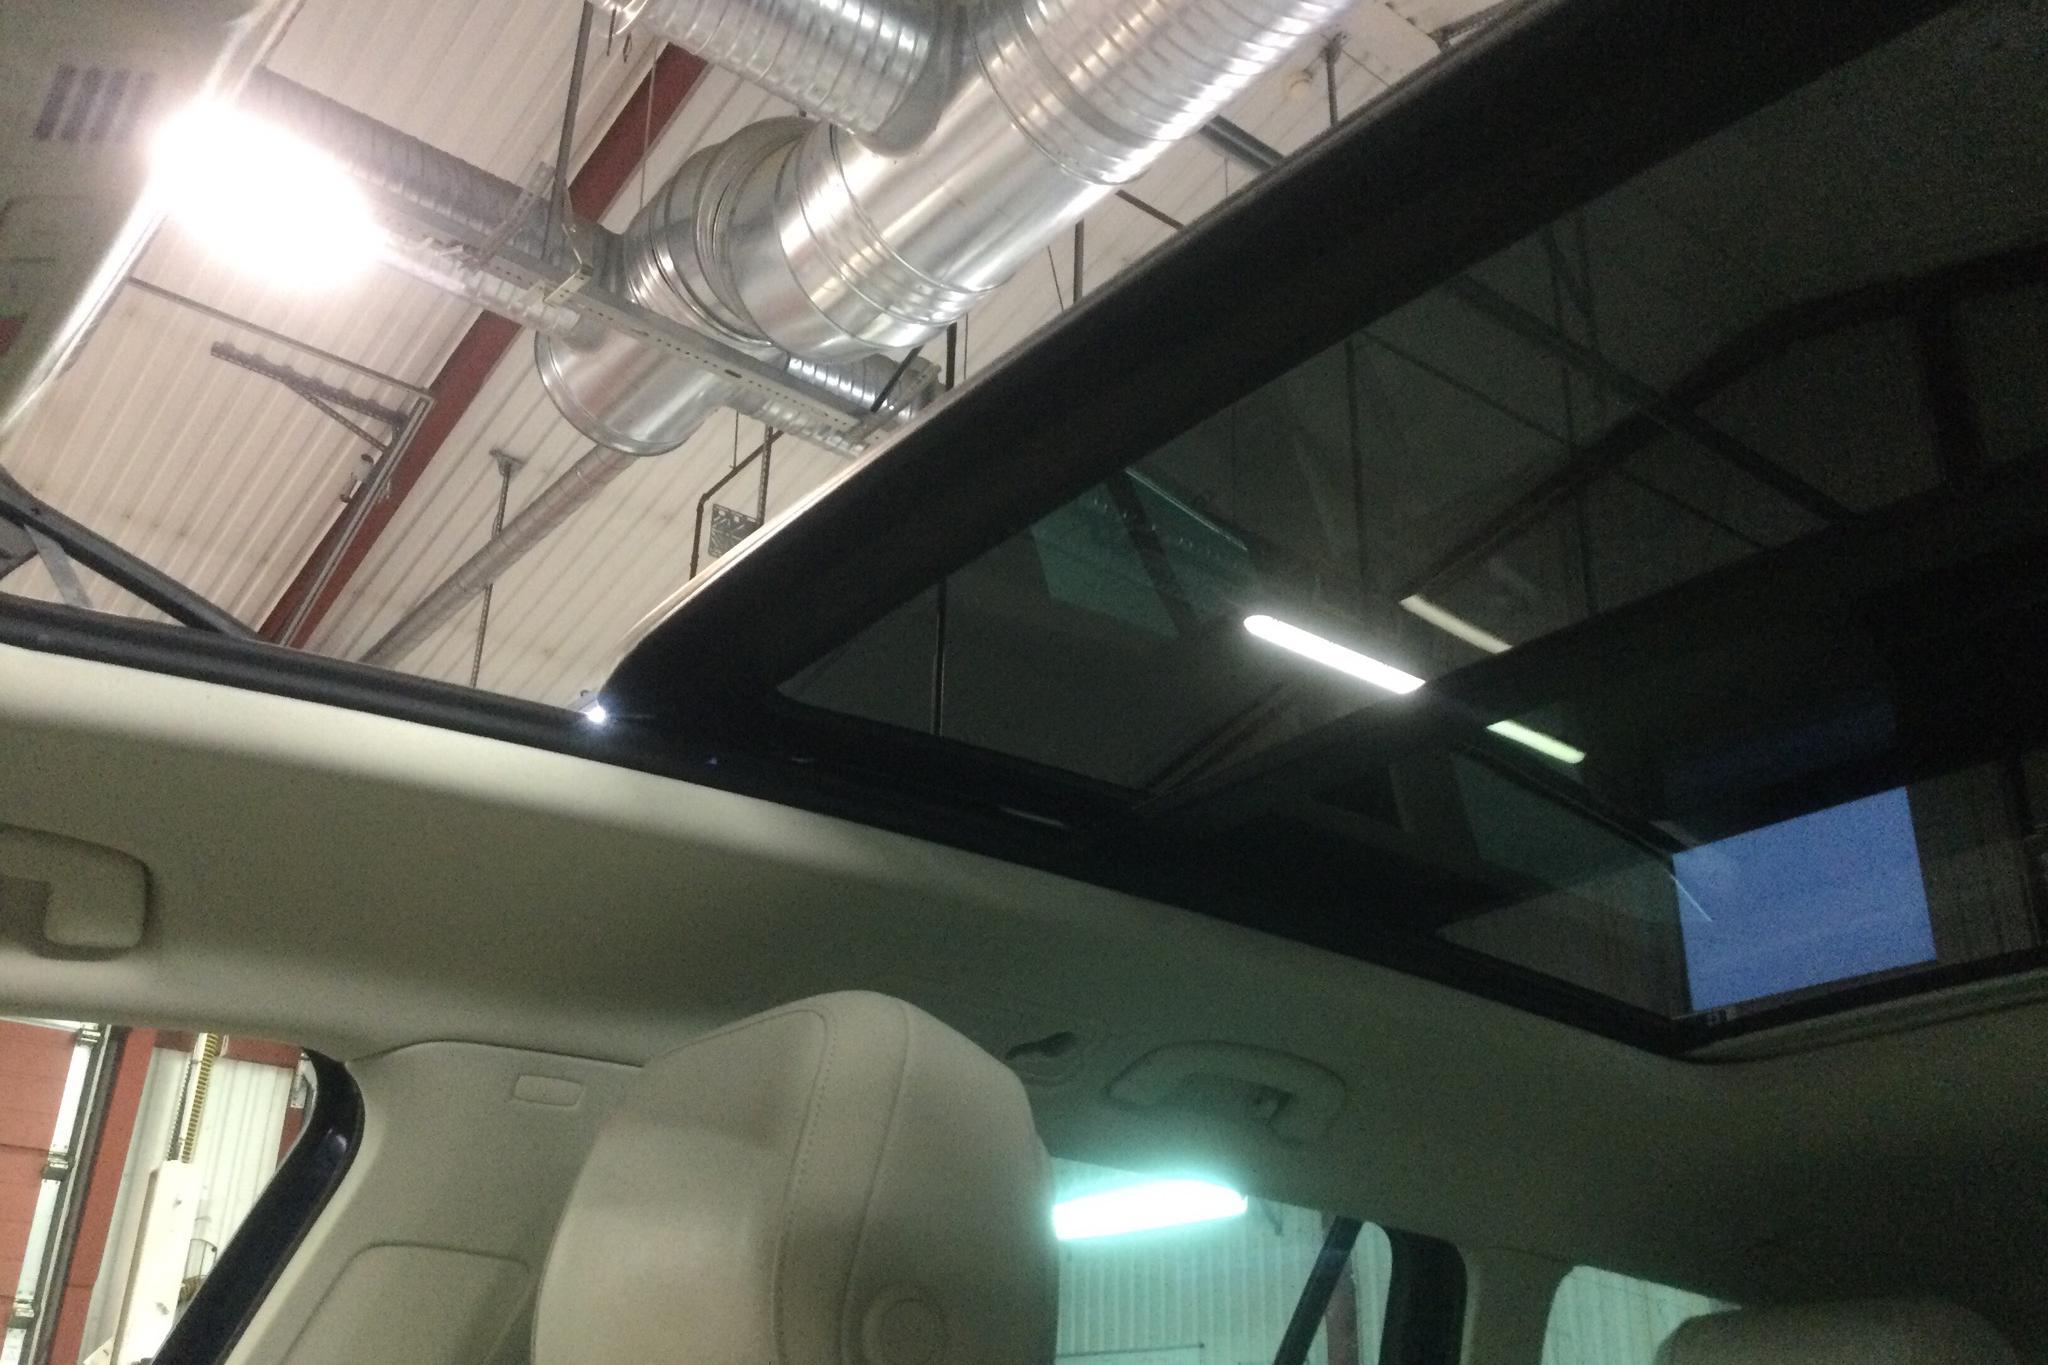 VW Passat 1.4 Plug-in-Hybrid Sportscombi (218hk) - 196 380 km - Automatic - Dark Blue - 2017